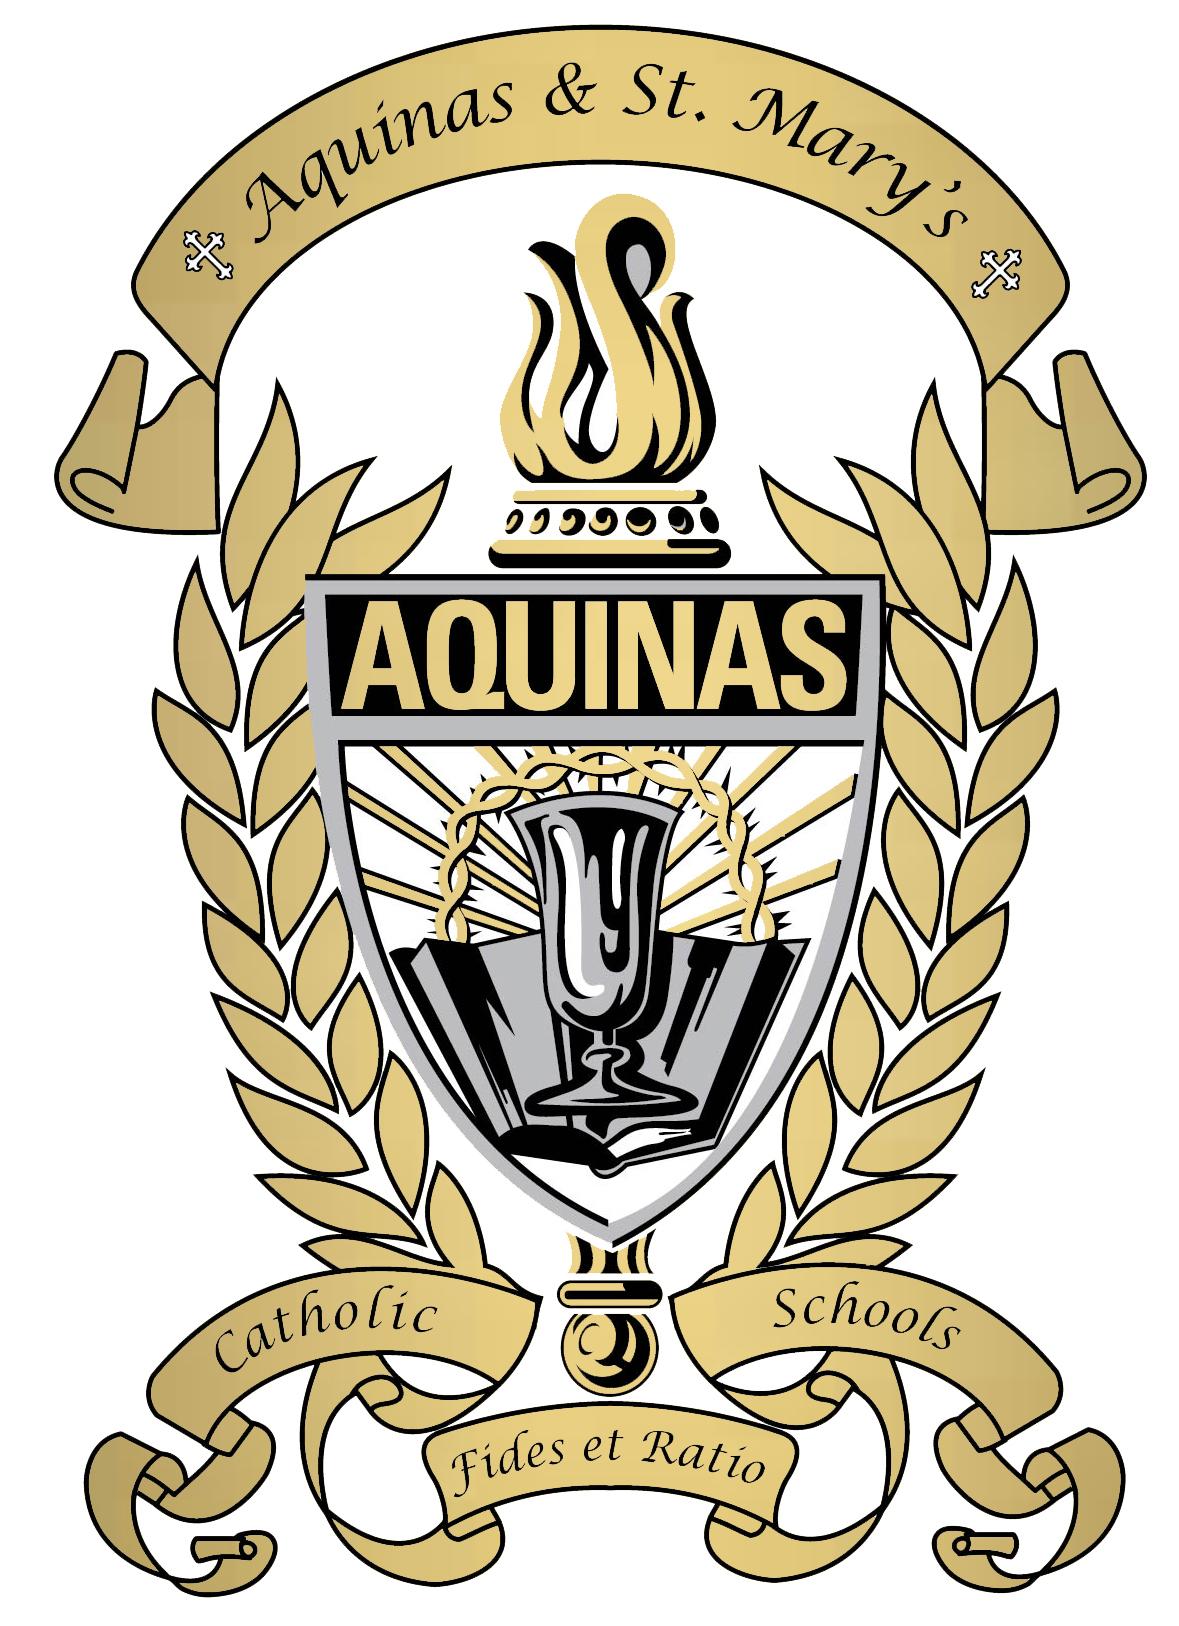 Aquinas St Marys Catholic Schools Aquinas St Marys